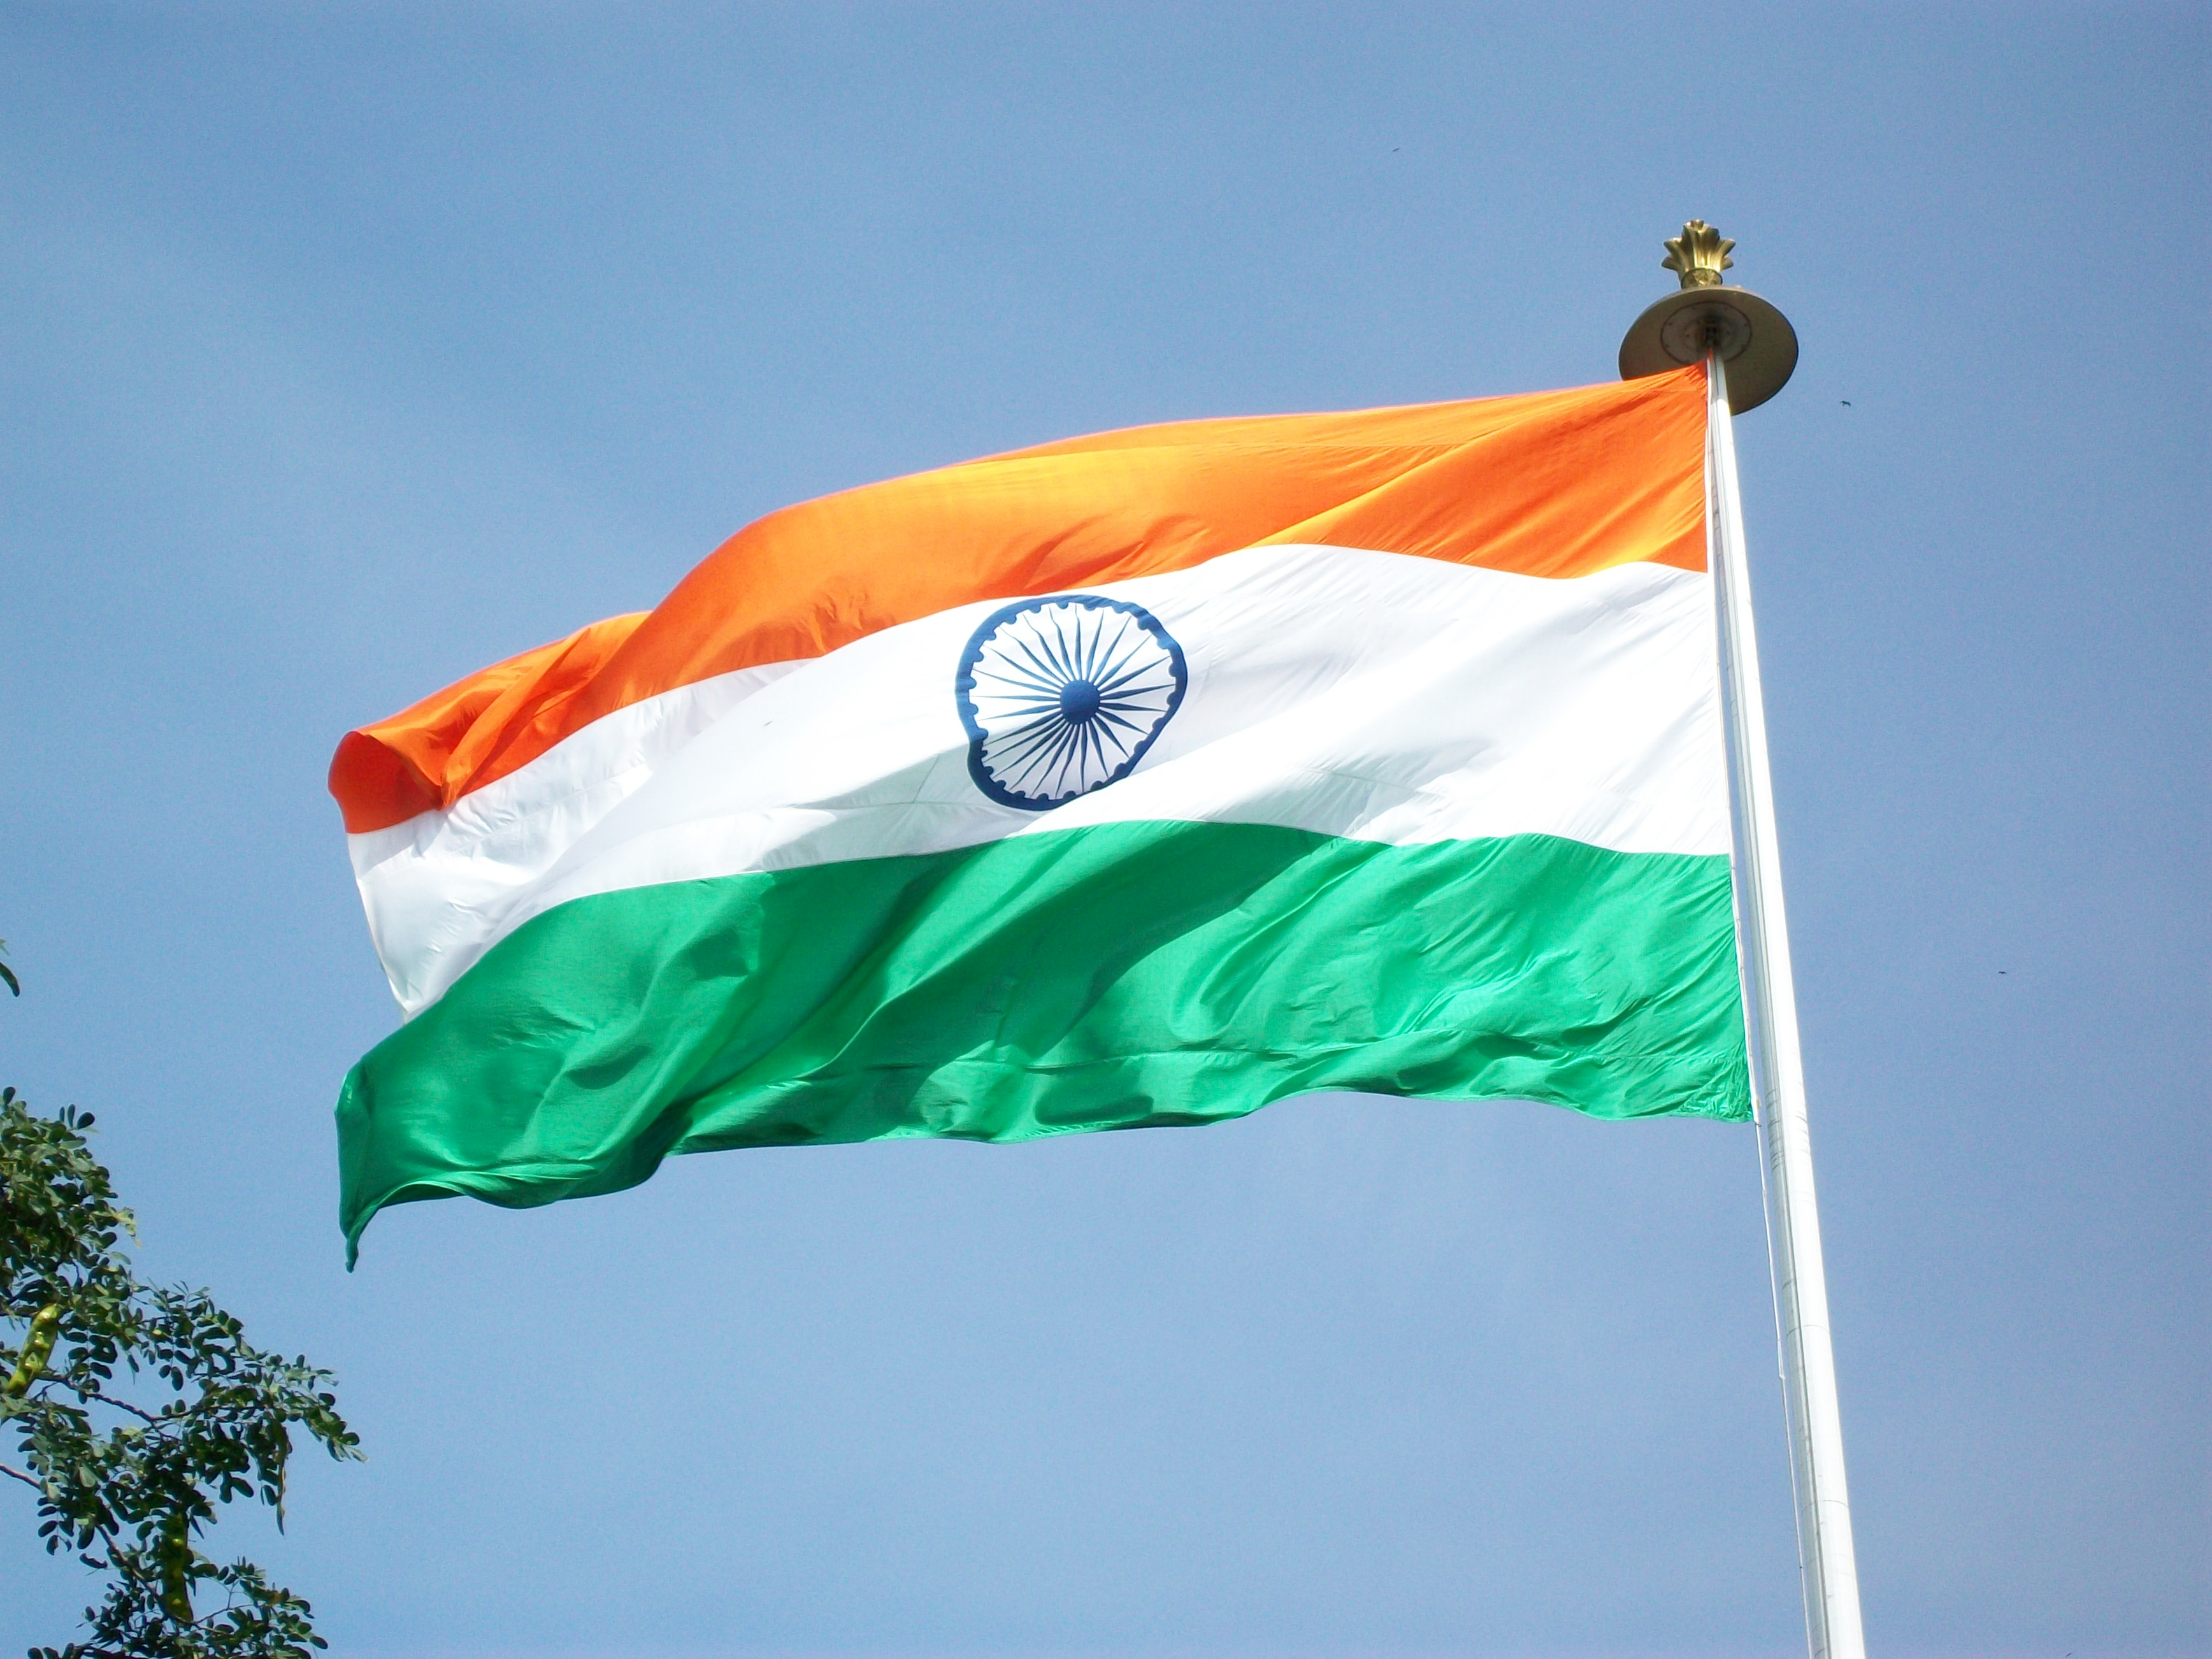 India S Flag: India Wallpaper 2013: India Flag Wallpaper